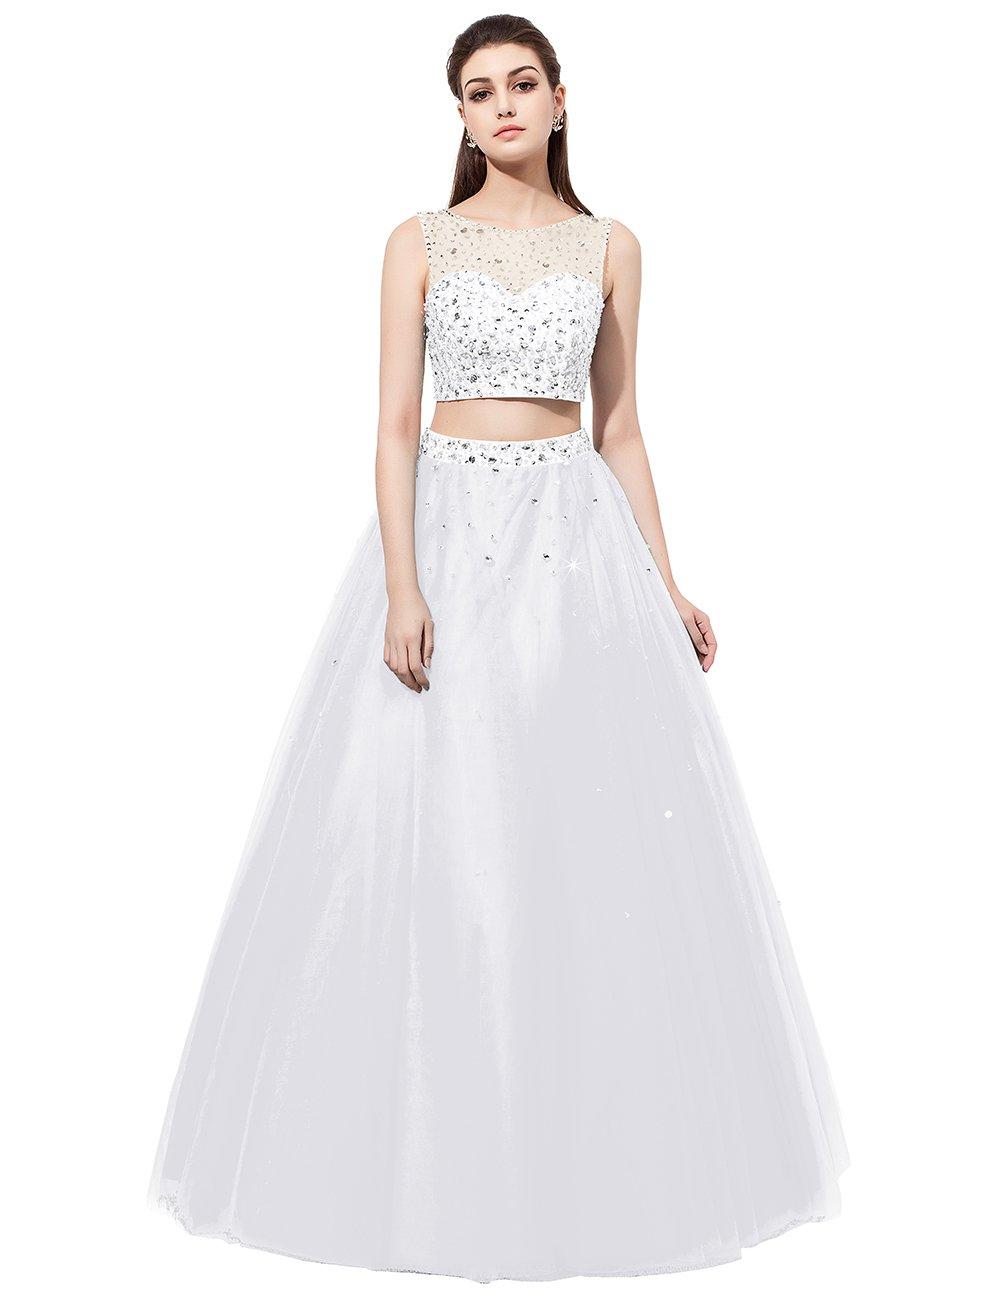 Dresstell 演奏会ドレス ステージドレス ビジュー付き ツーピースドレス 袖なし ビスチェタイプ 発表会ドレス カラーチュチュ 舞台ドレス B01MR2UPU5 JP17 ホワイト ホワイト JP17